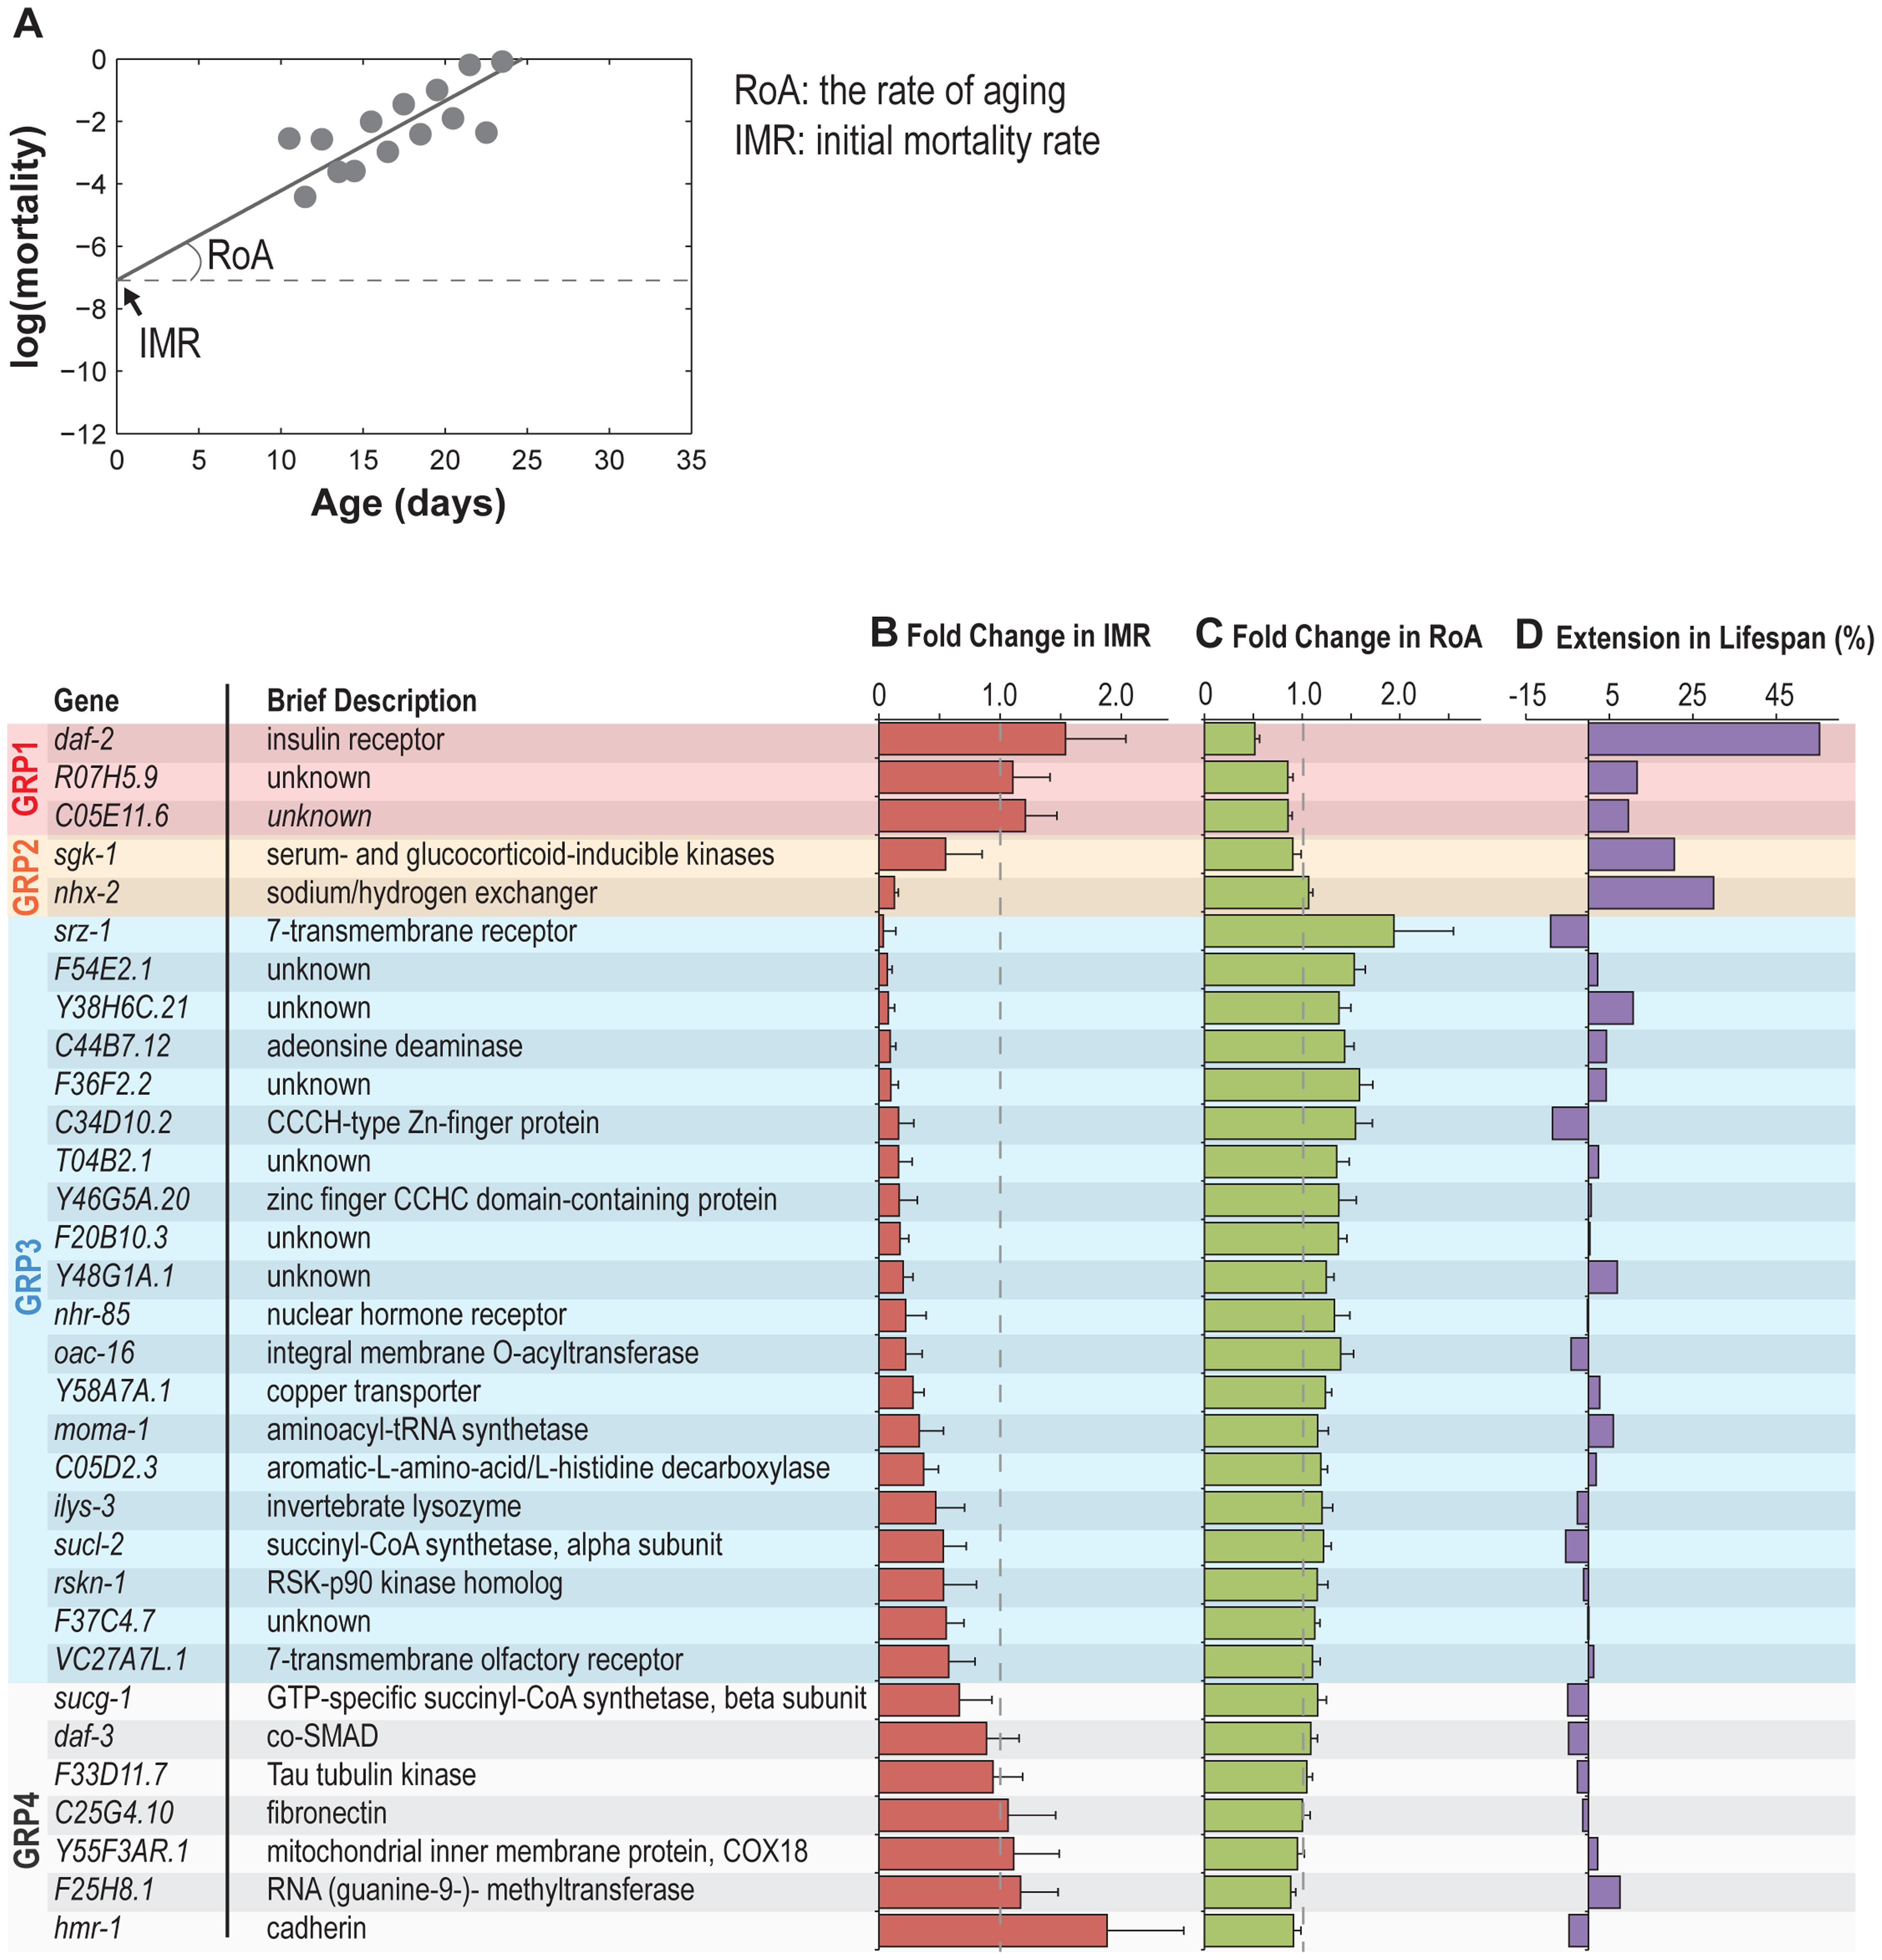 Reproductive longevity regulatory genes modulate somatic longevity.